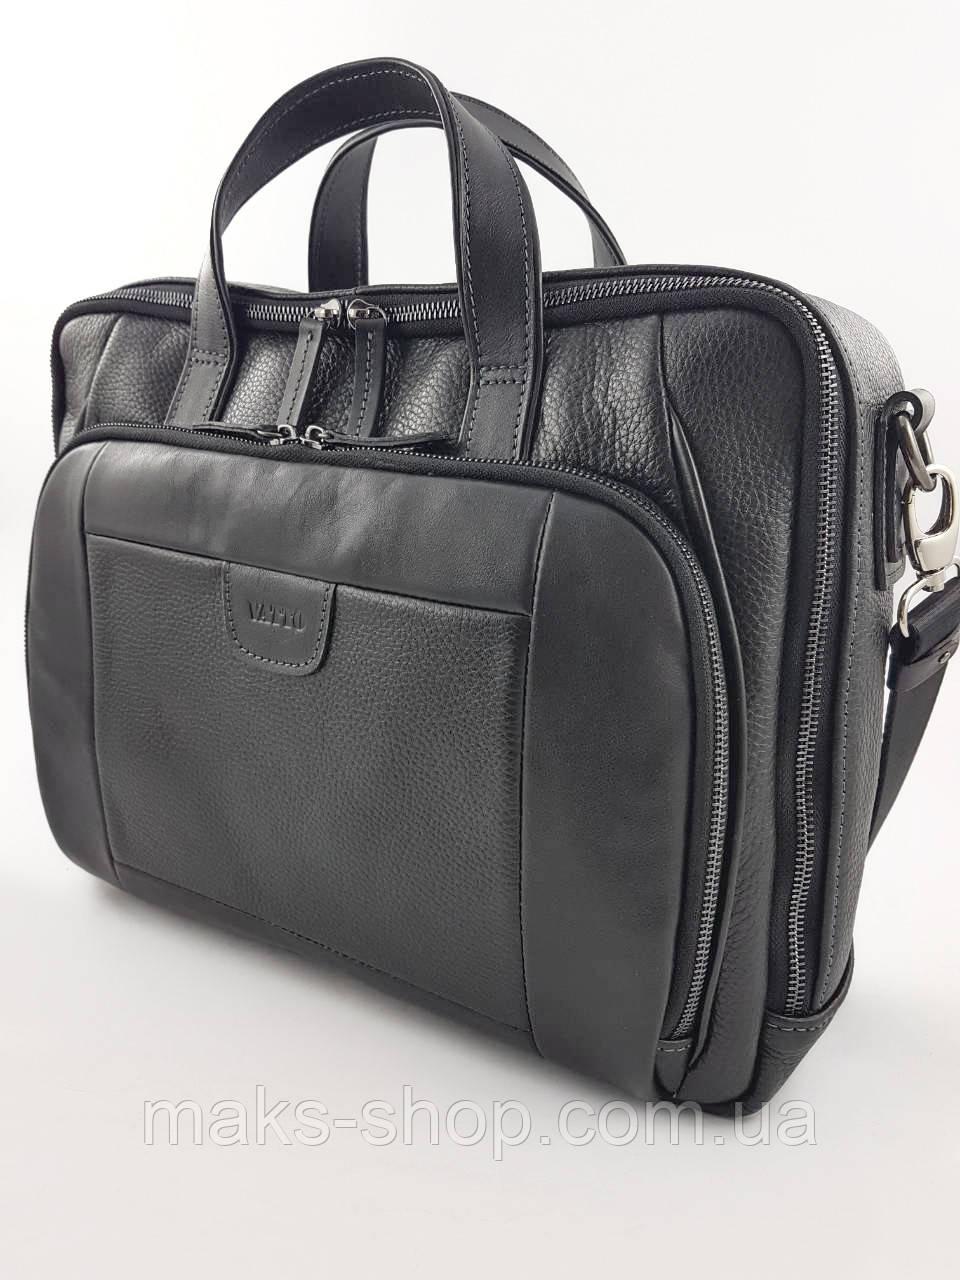 886395a56d2b Вместительная кожаная мужская сумка/деловой портфель VATTO Mk85 F8Kaz1 -  Maks Shop- надежный и